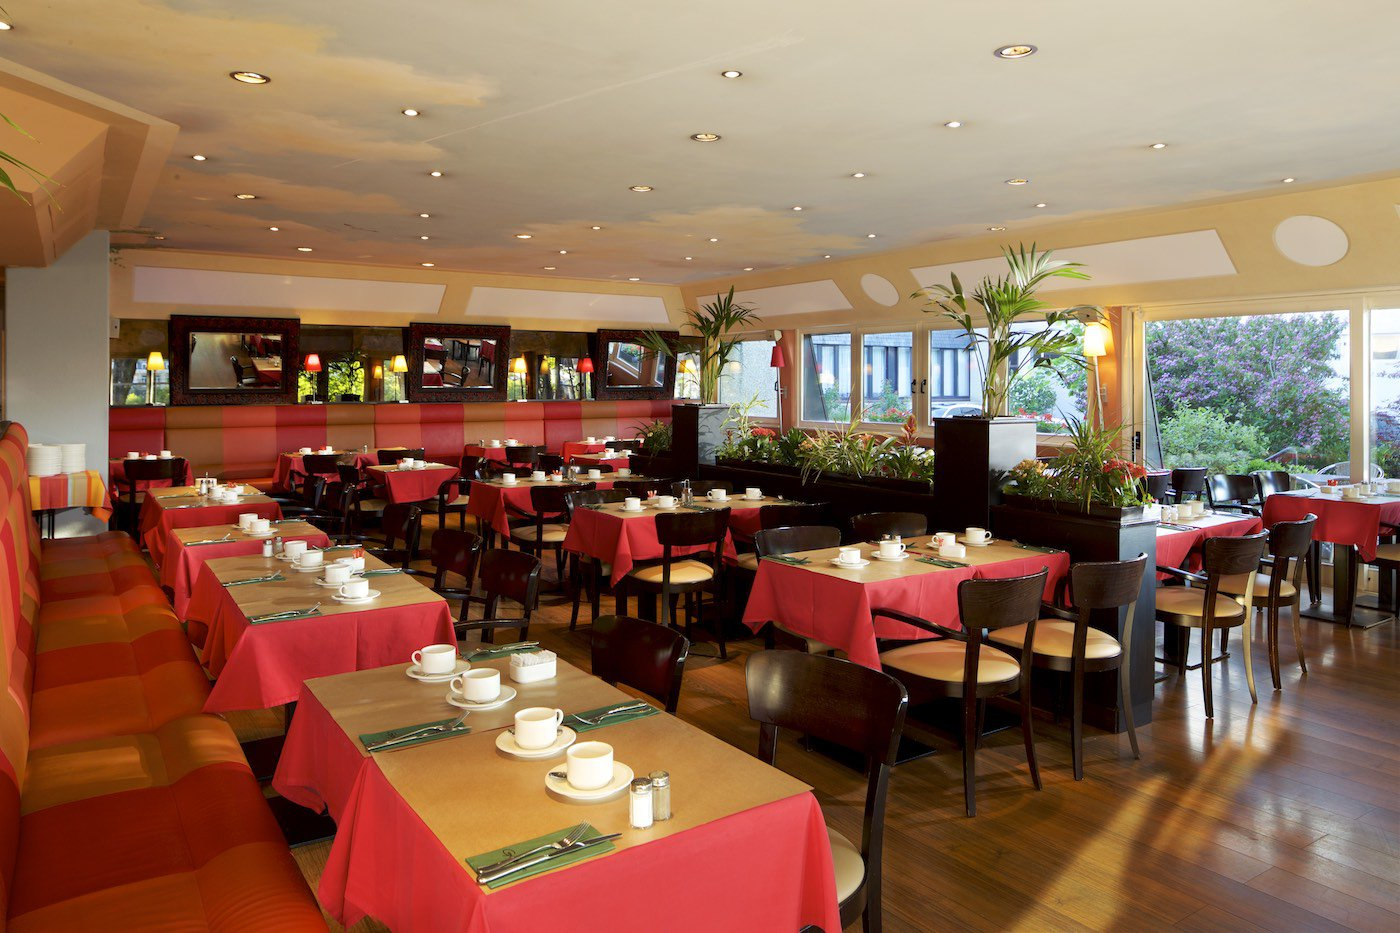 Goeres Hotels - Restaurant Le Bec Fin